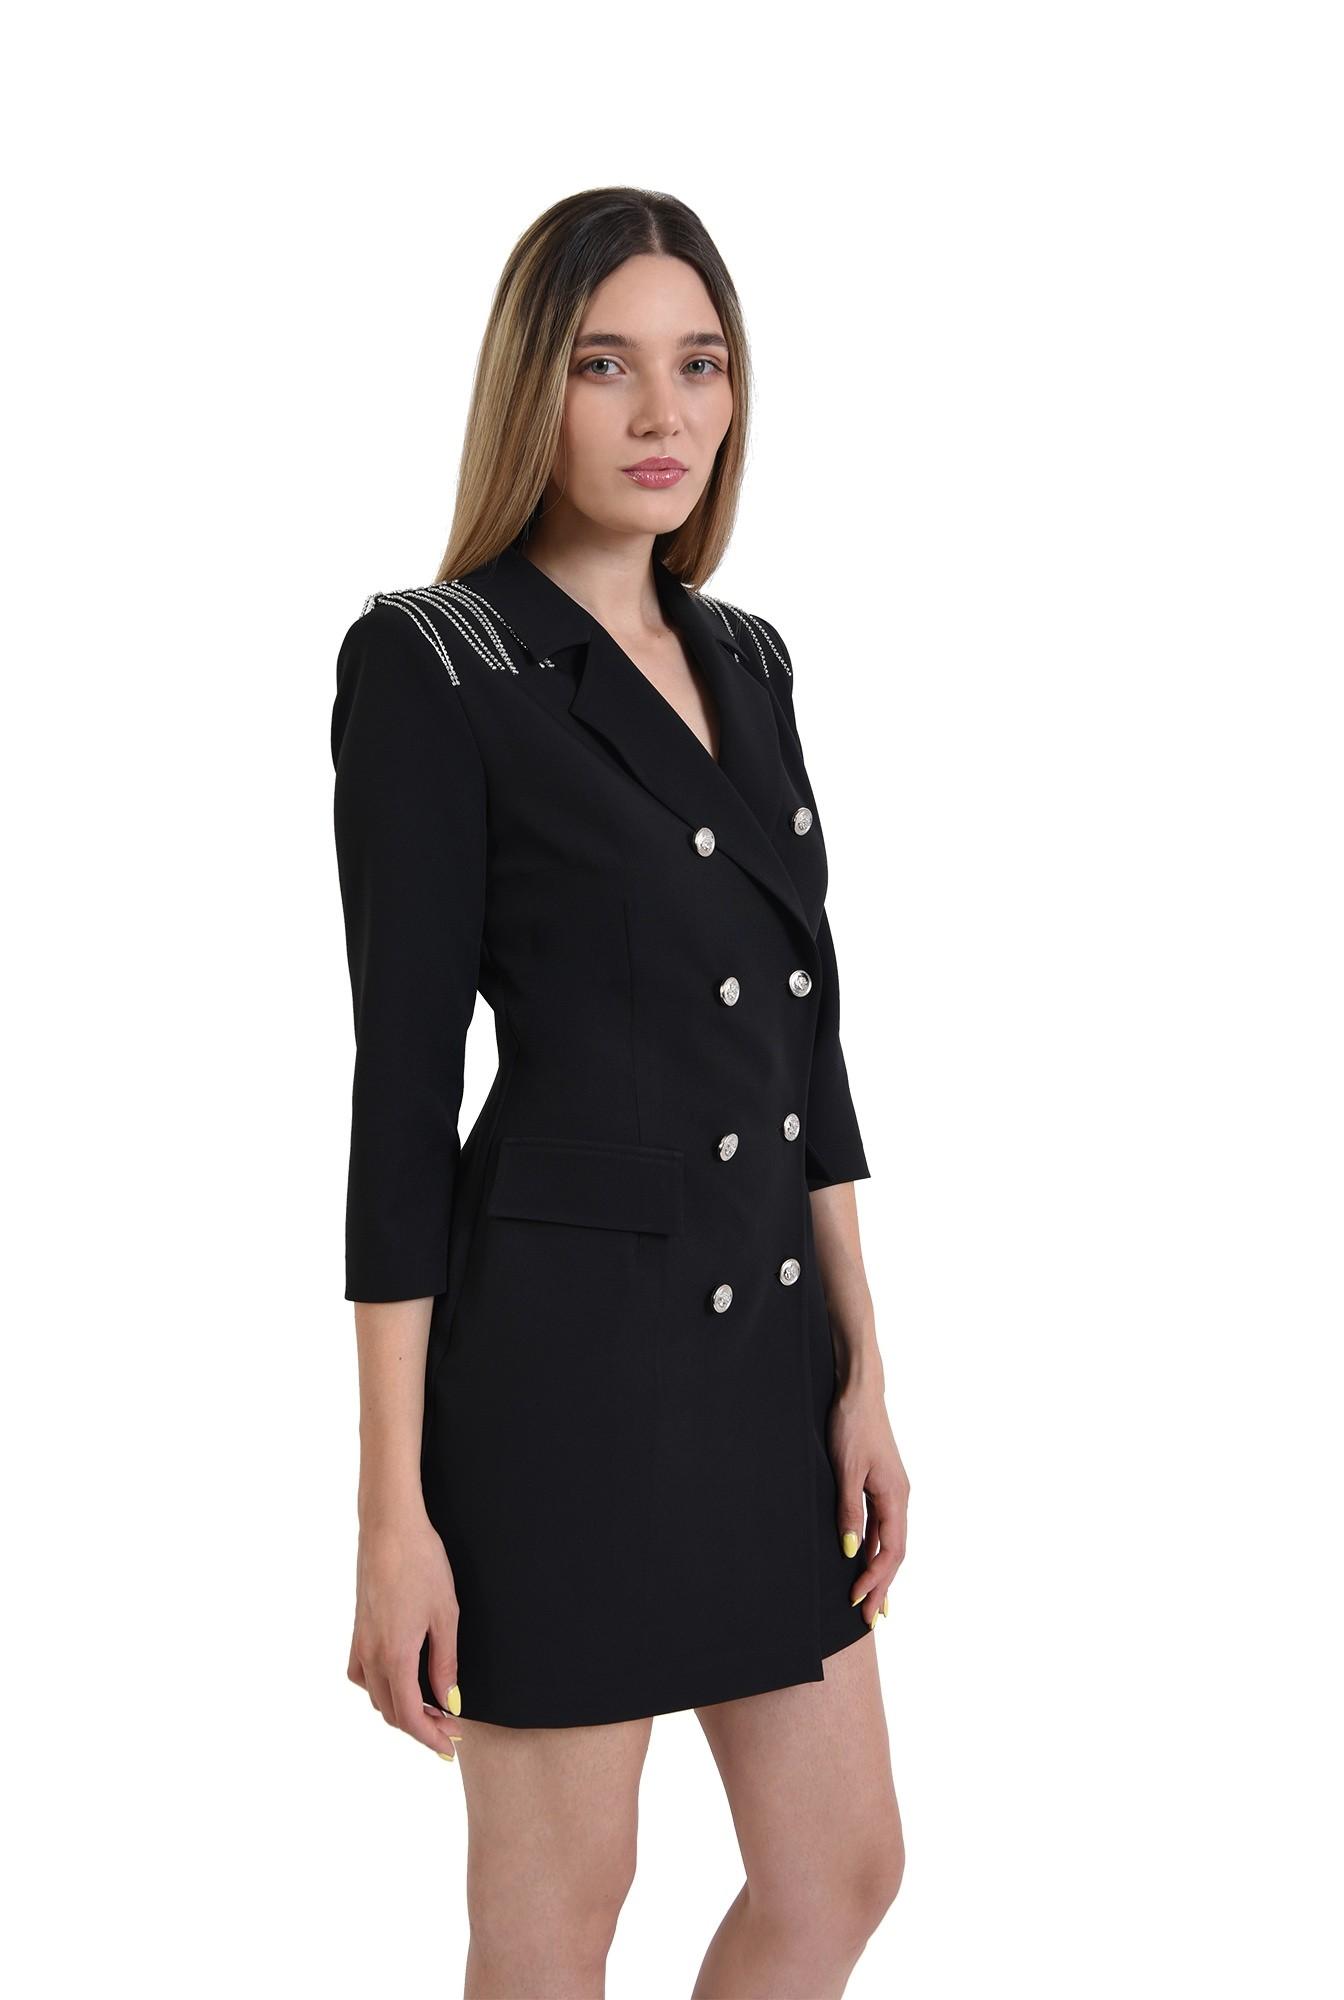 3 - rochie neagra, stil sacou, cu nasturi metalici